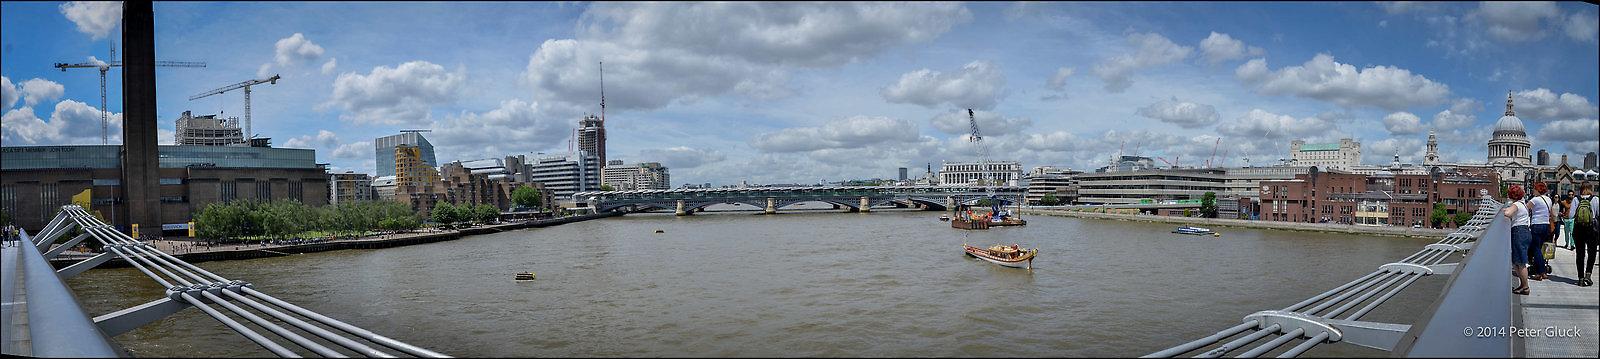 London 2014 06 10 PG 168